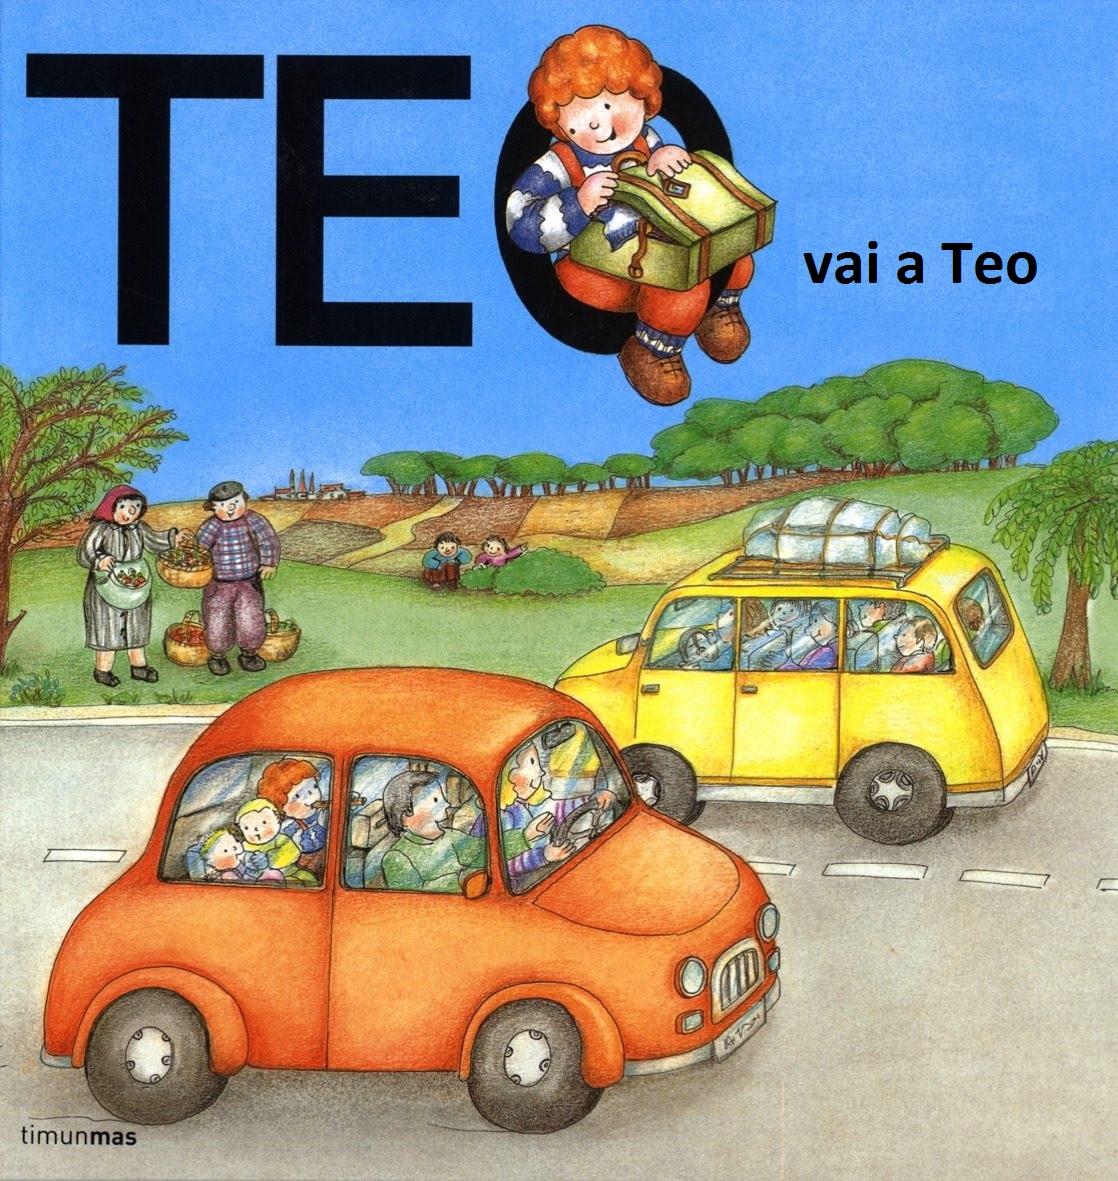 Teo vai aTeo